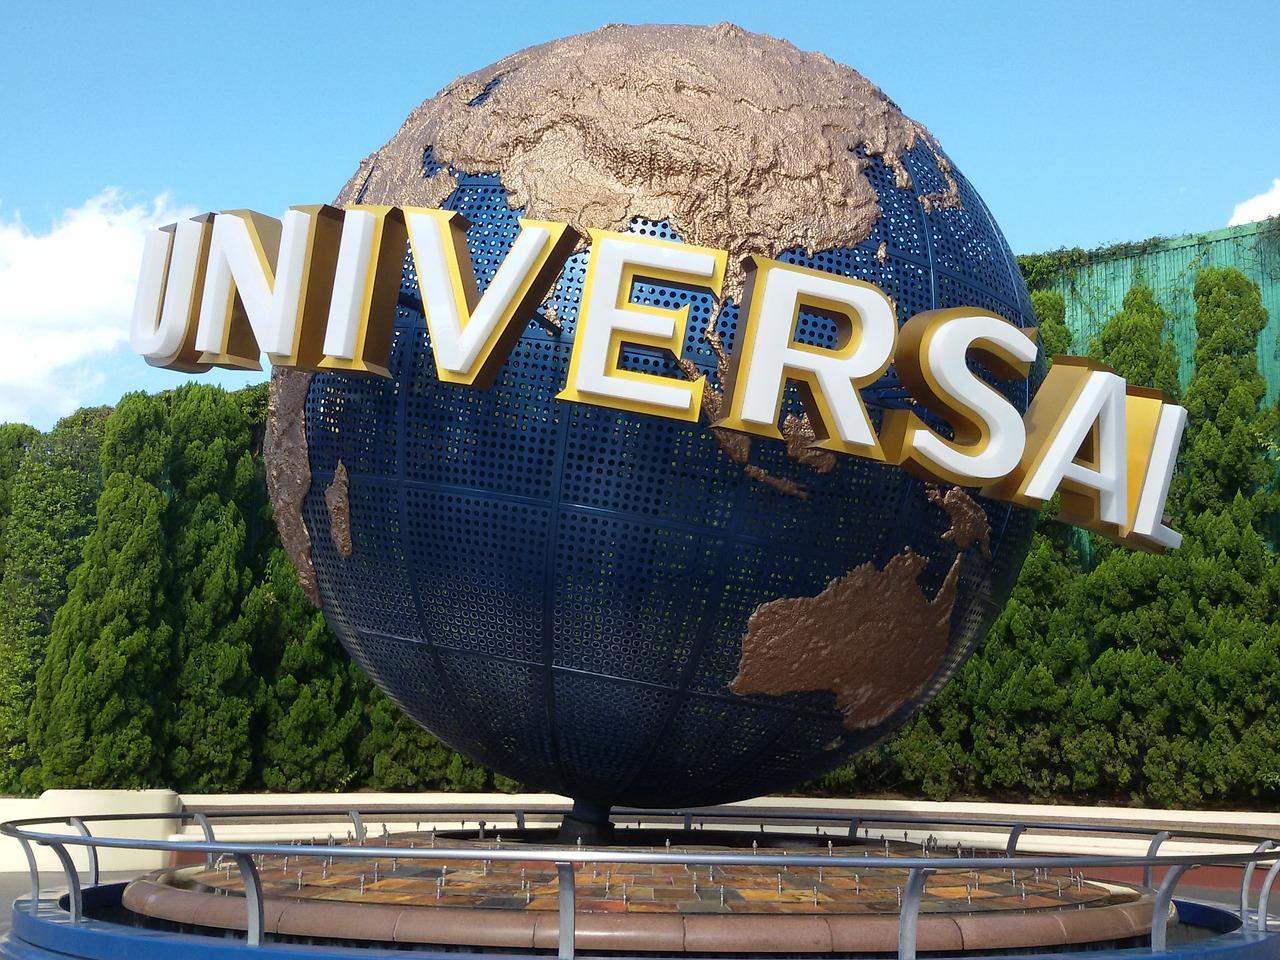 30 things before 30 | Universal Studios